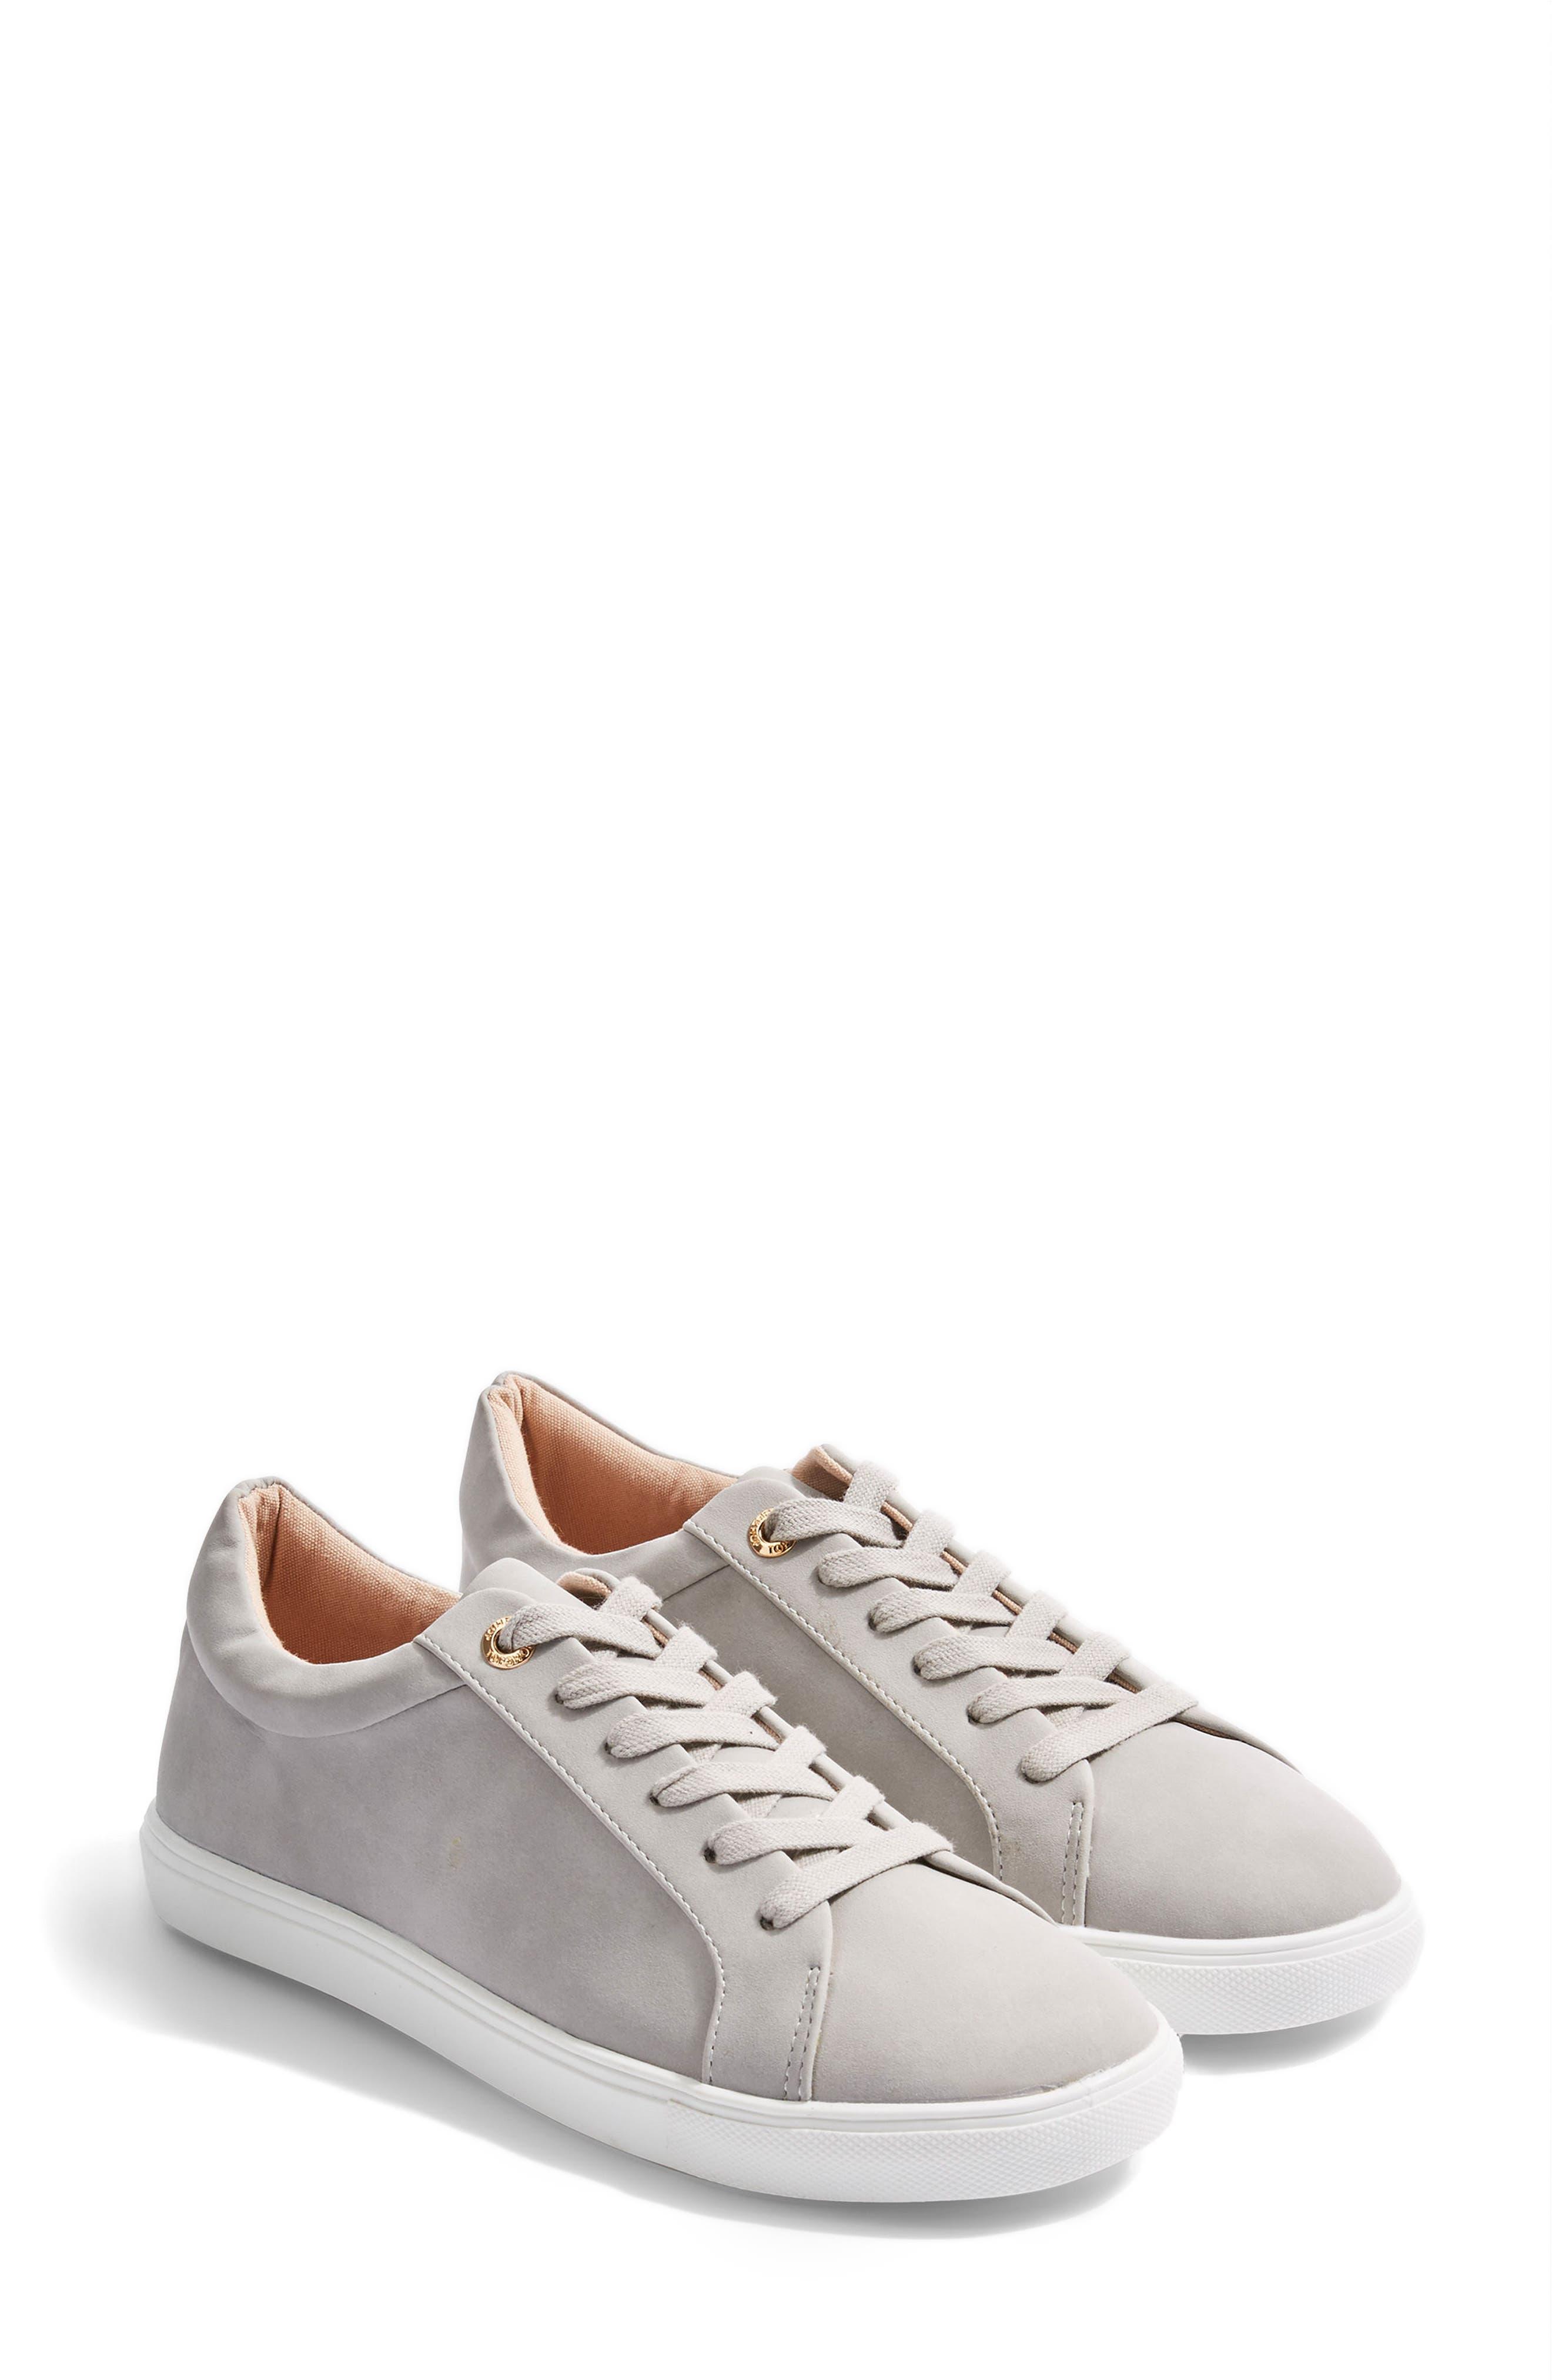 Cookie Low Top Sneaker,                         Main,                         color, GREY MULTI